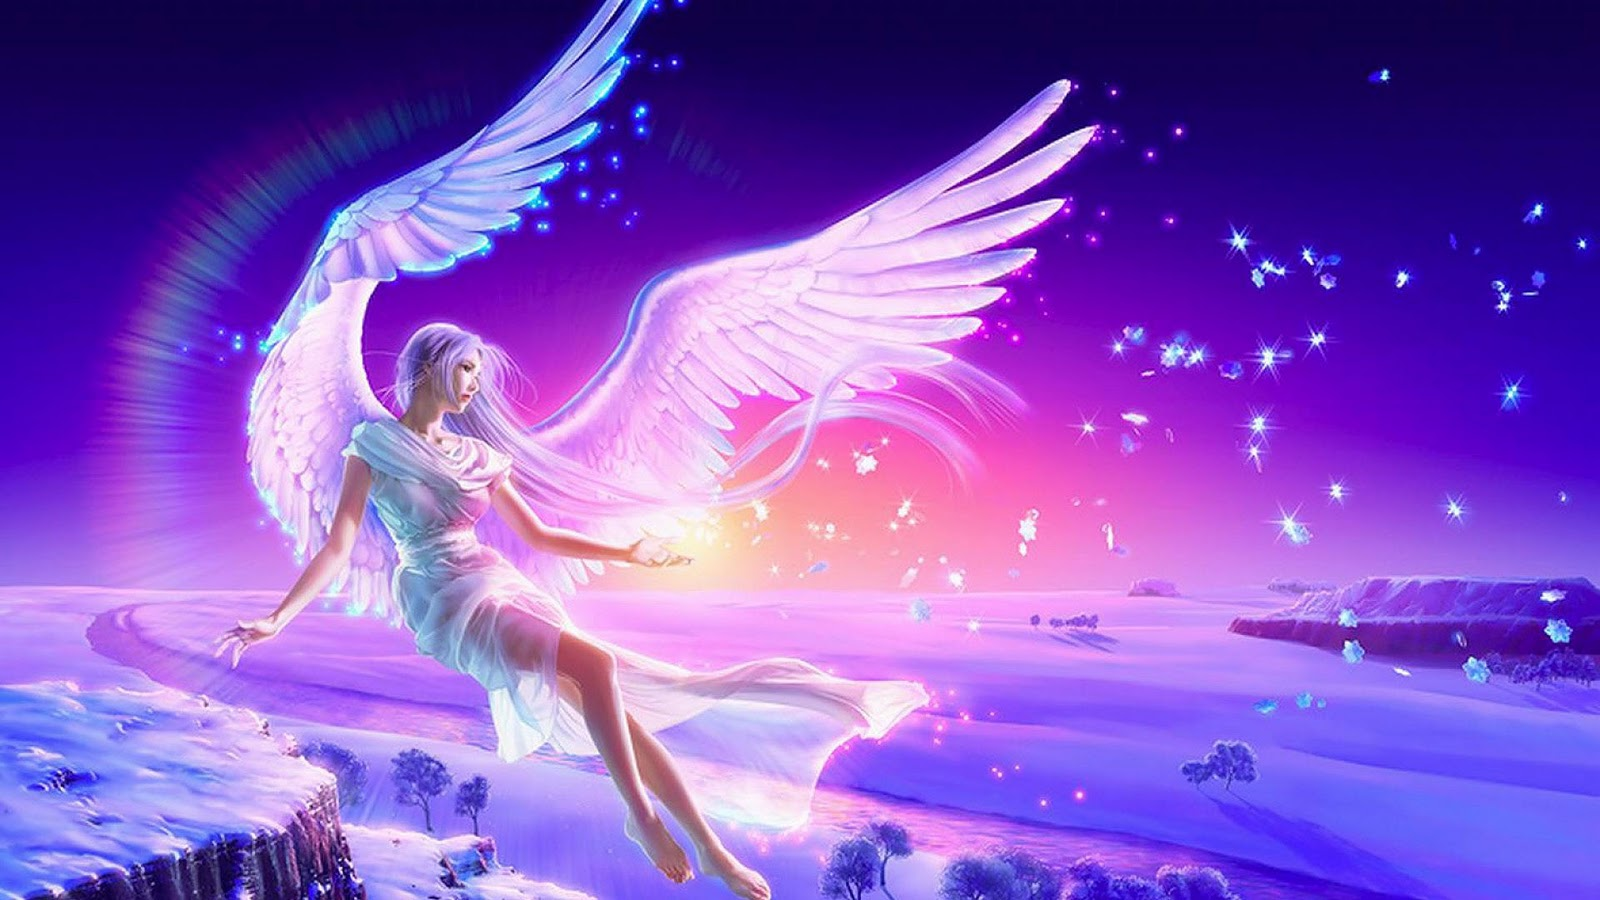 Best Wallpaper Collection: Best Angel Wallpapers